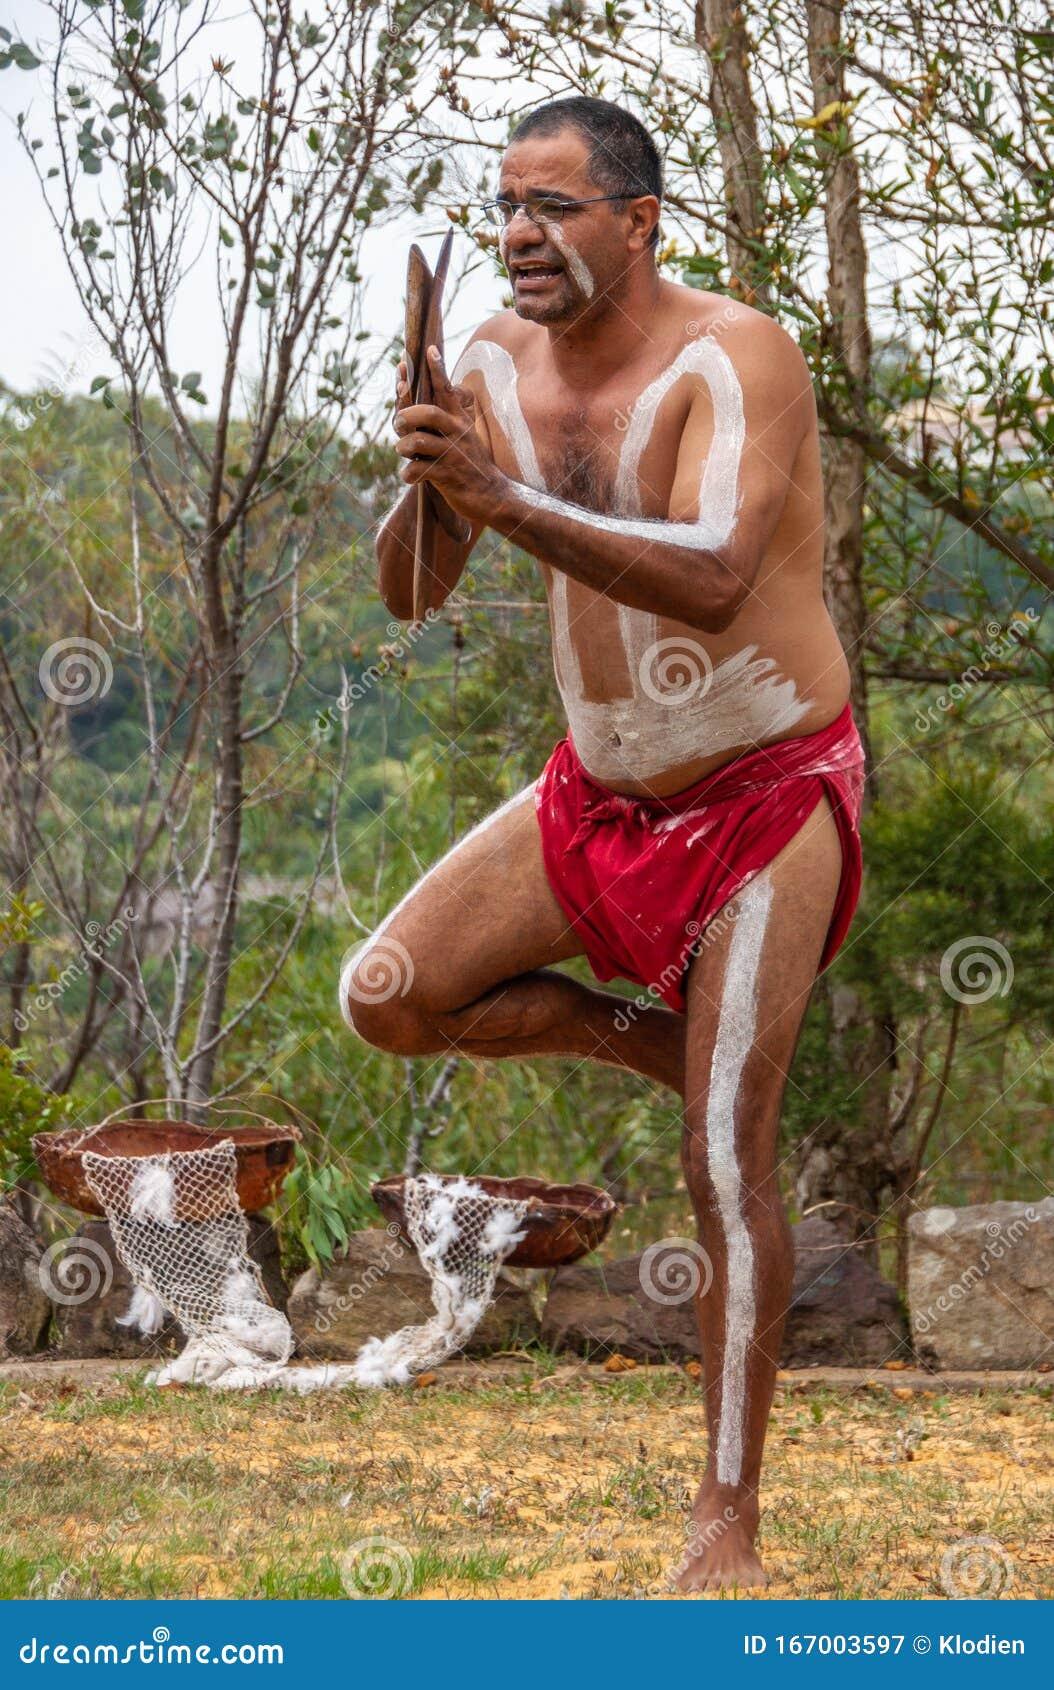 Aboriginal women perform at public ceremony - ABC News